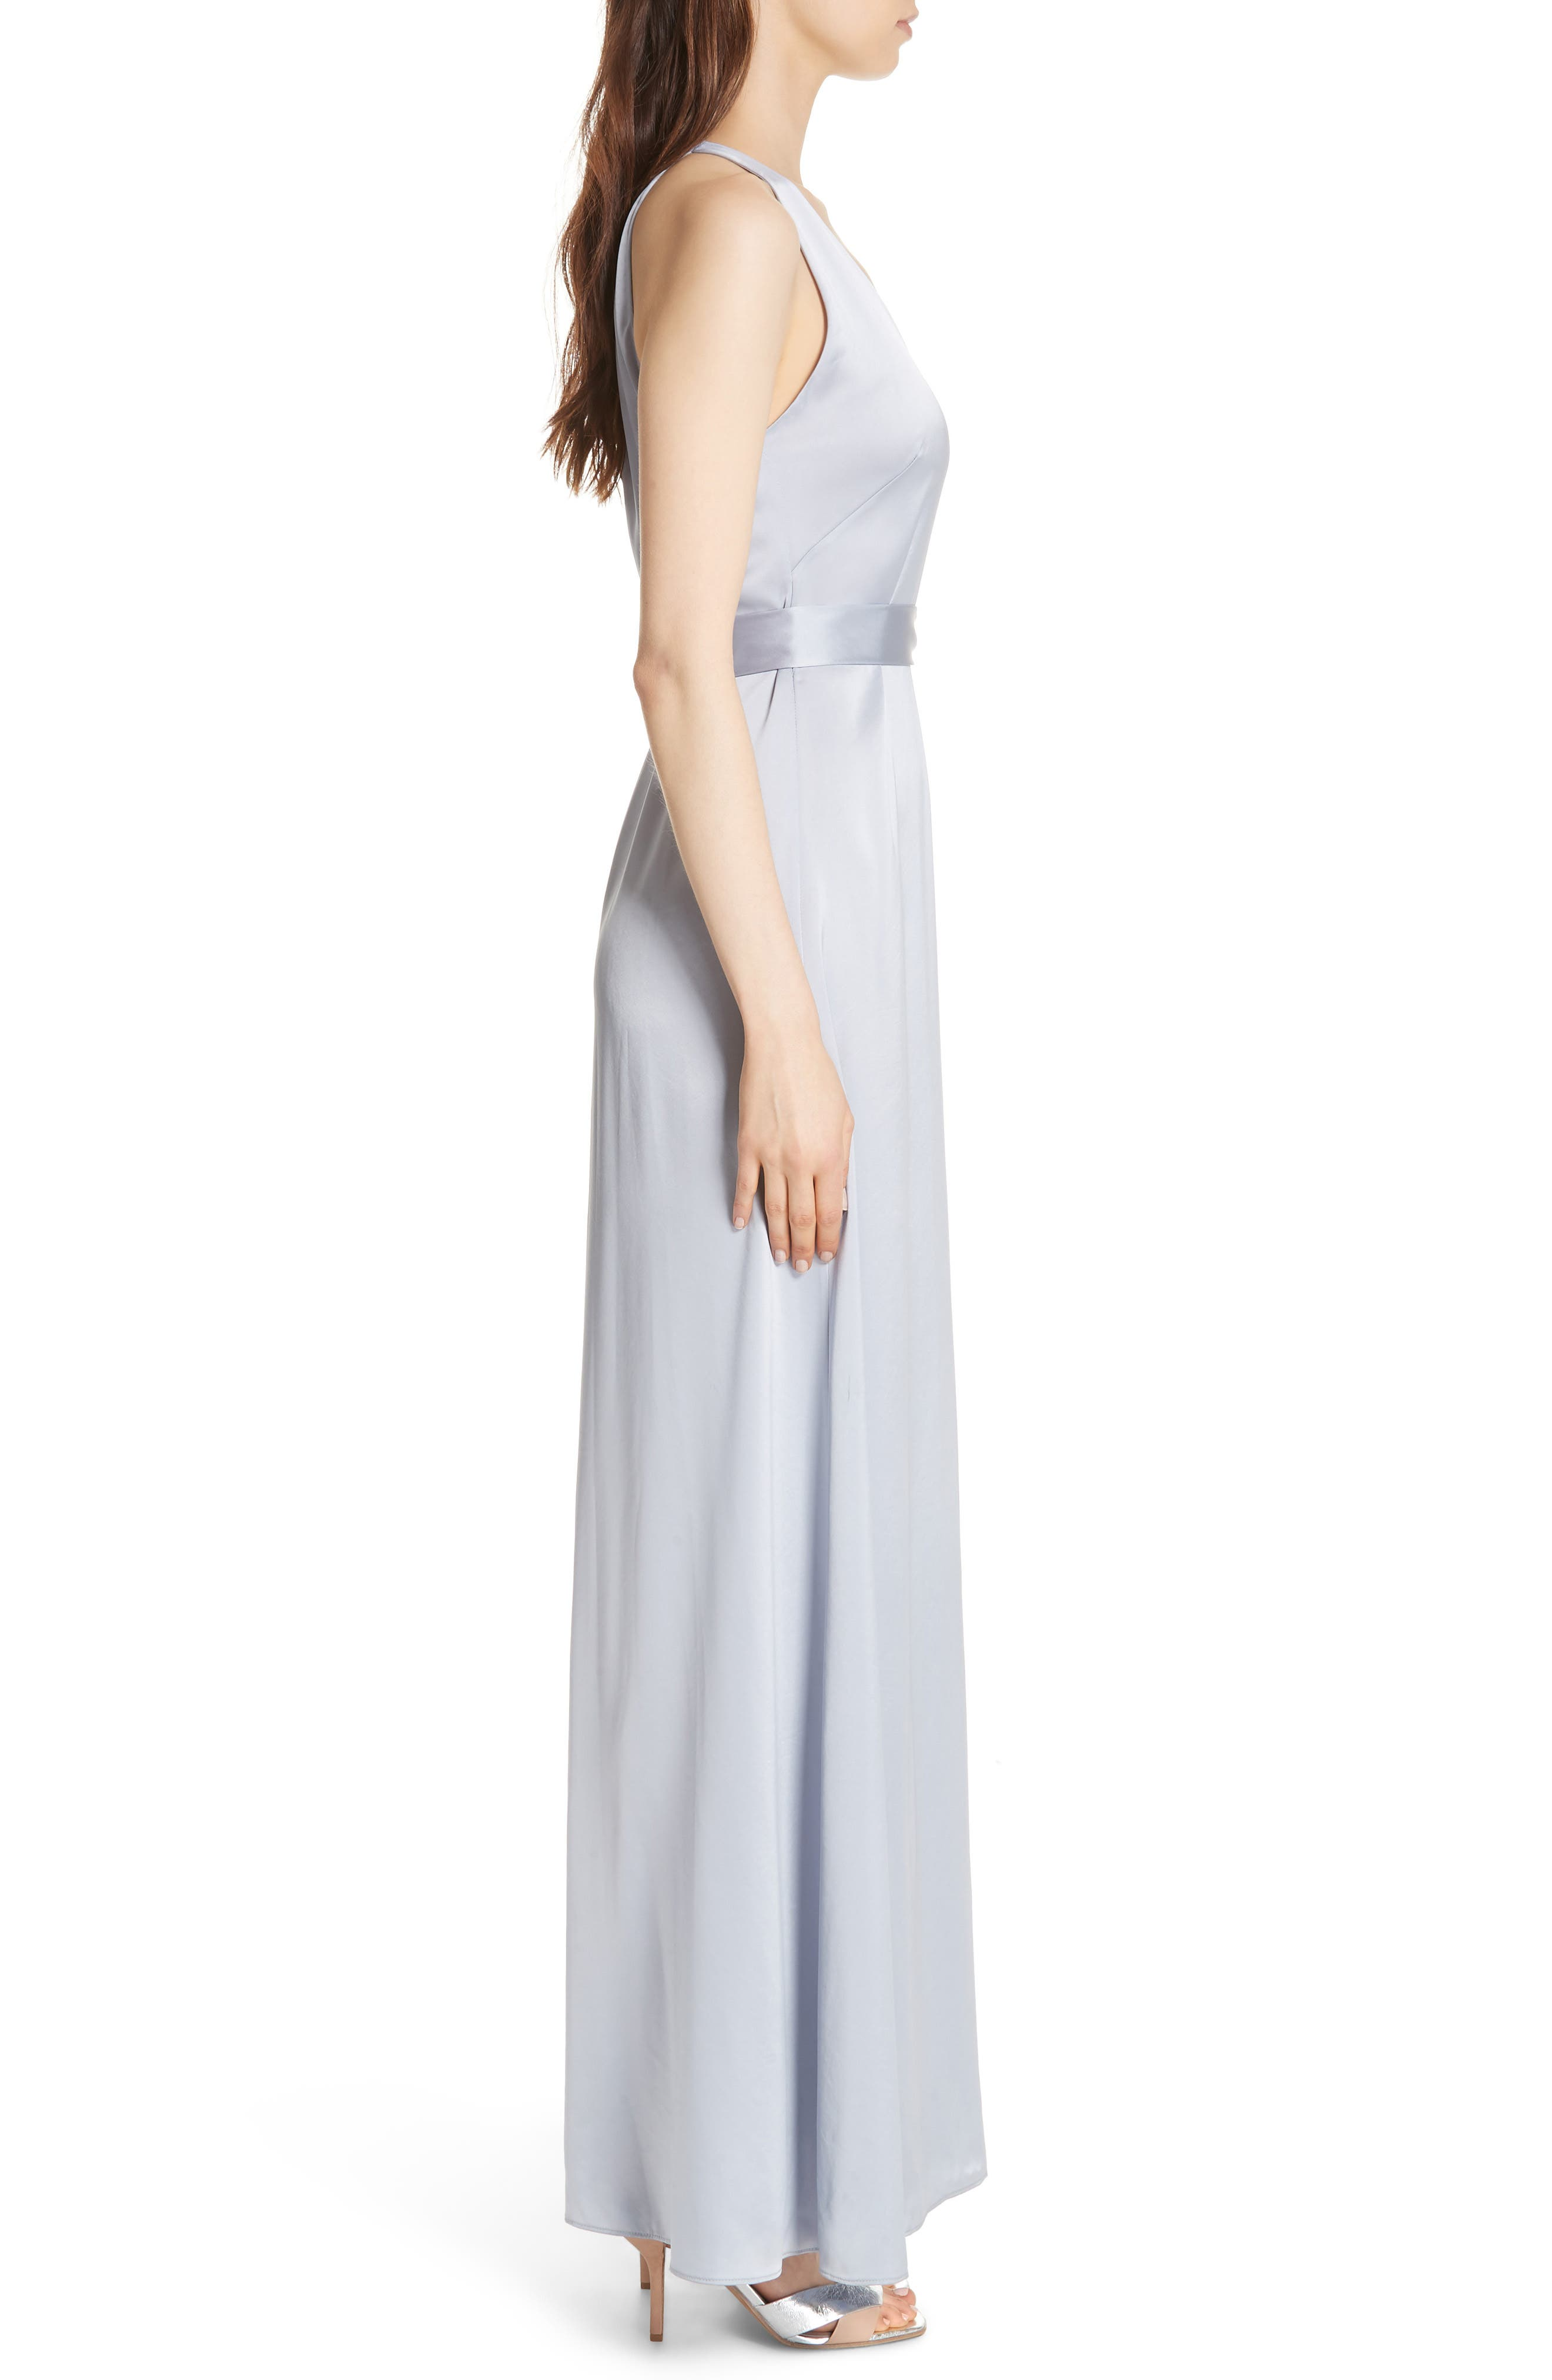 Diane von Furstenberg Wrap Gown,                             Alternate thumbnail 3, color,                             031